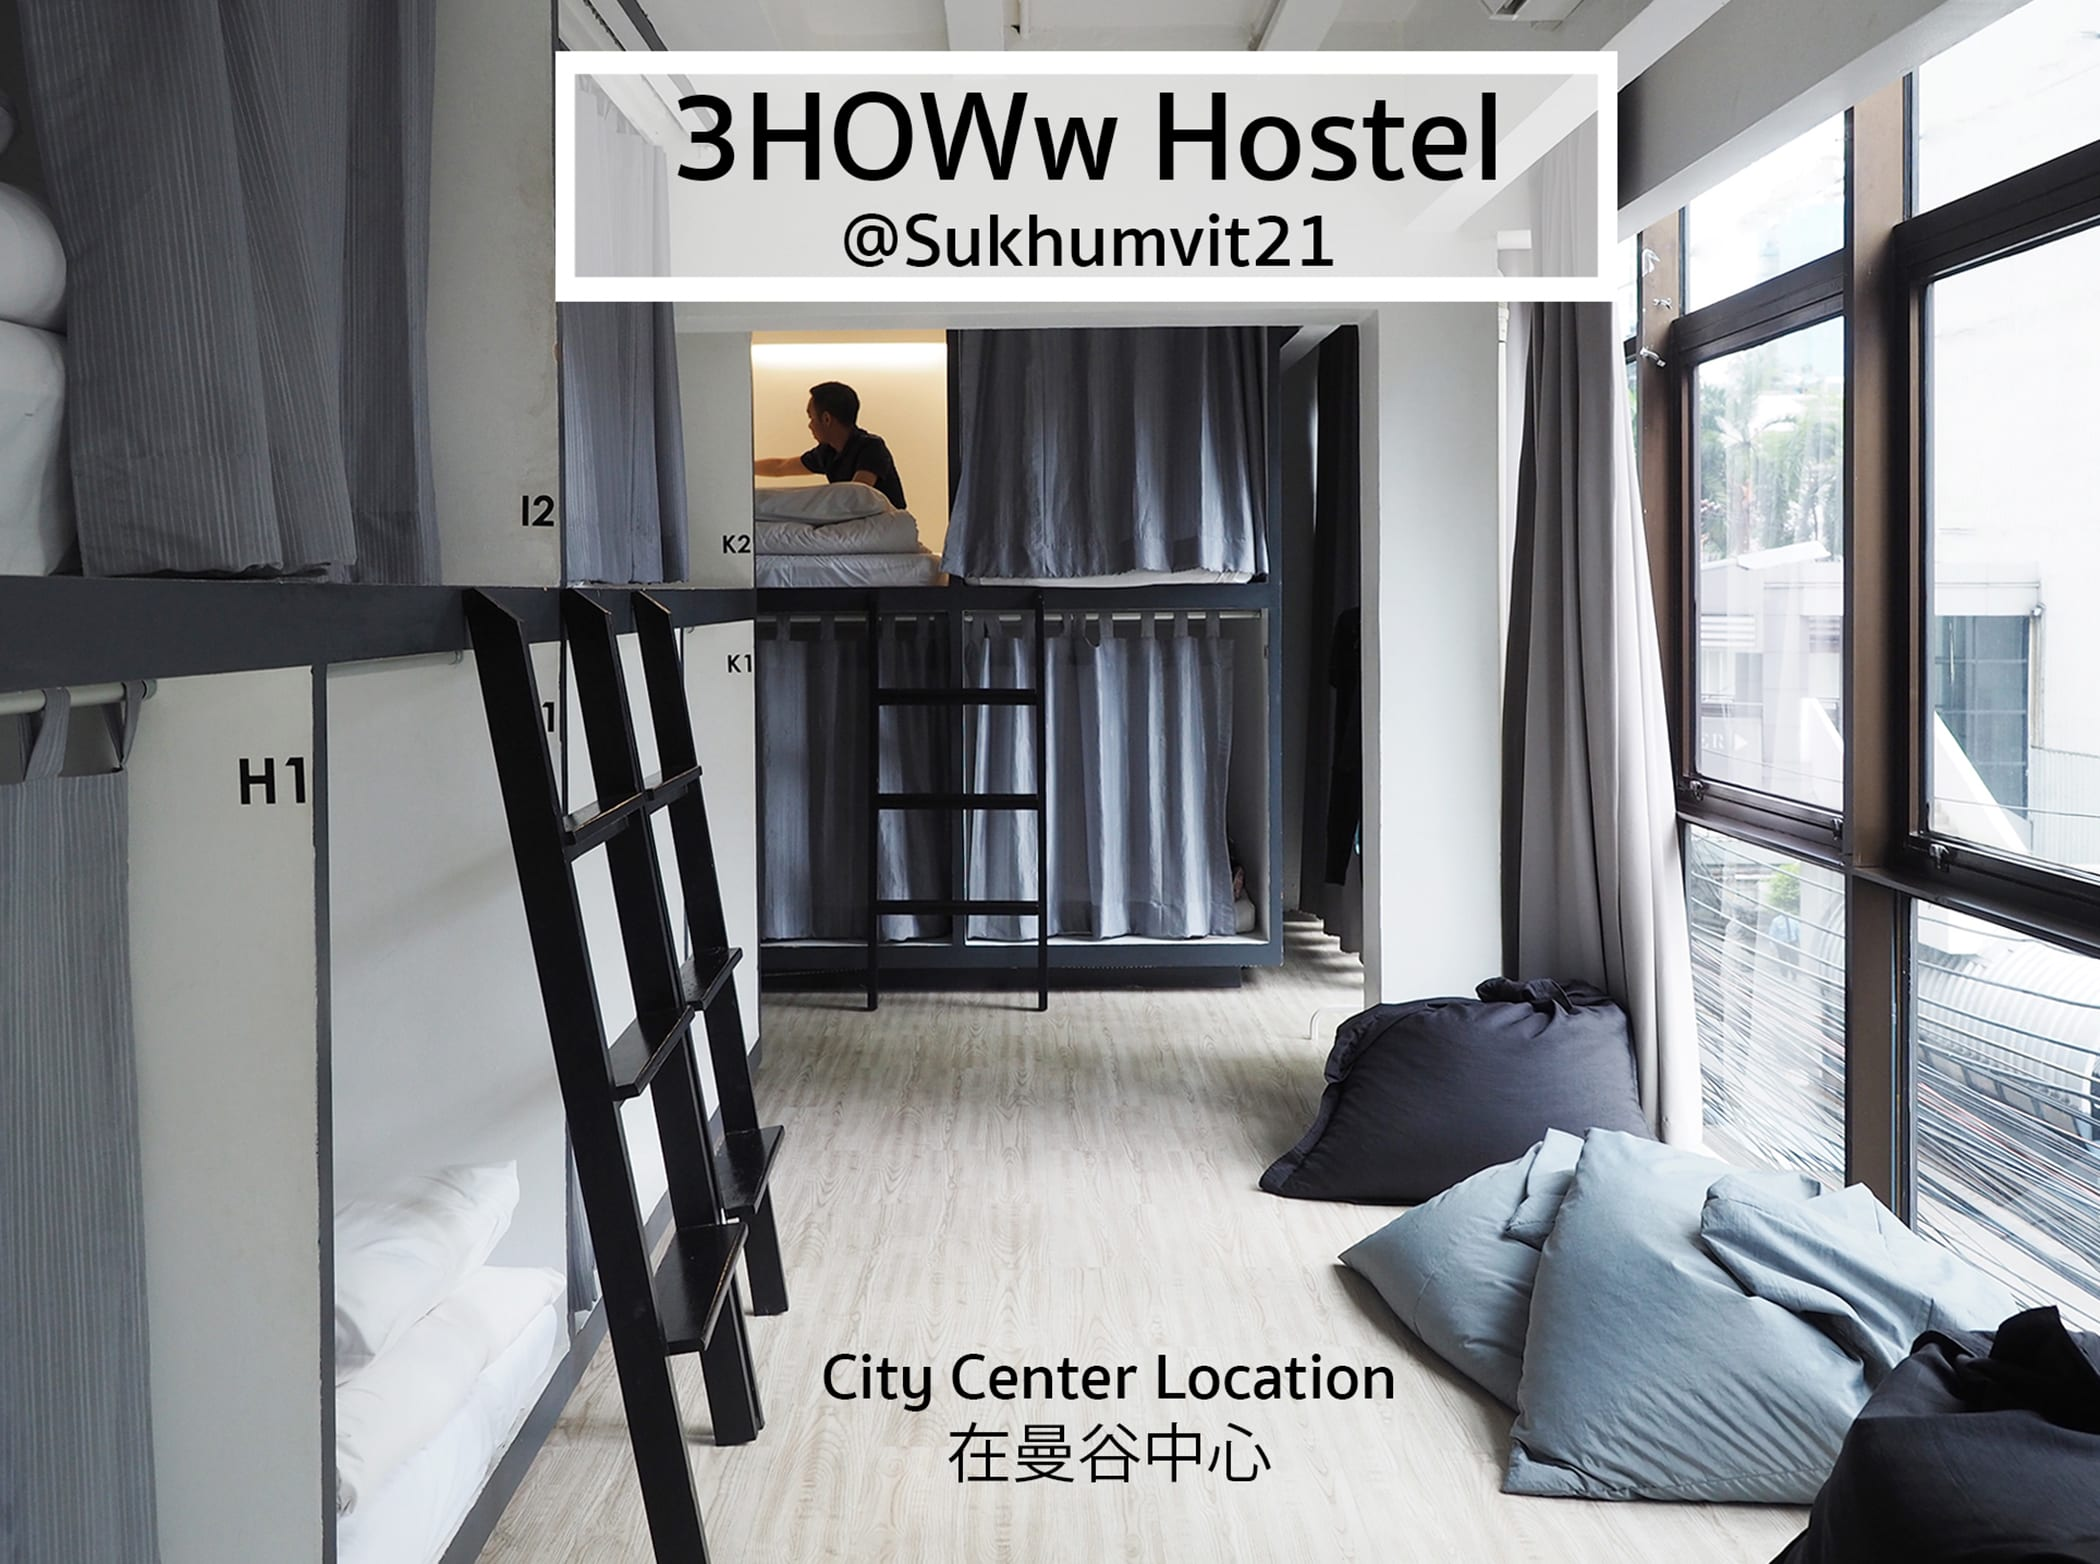 3Howw Hostel at Sukhumvit 21